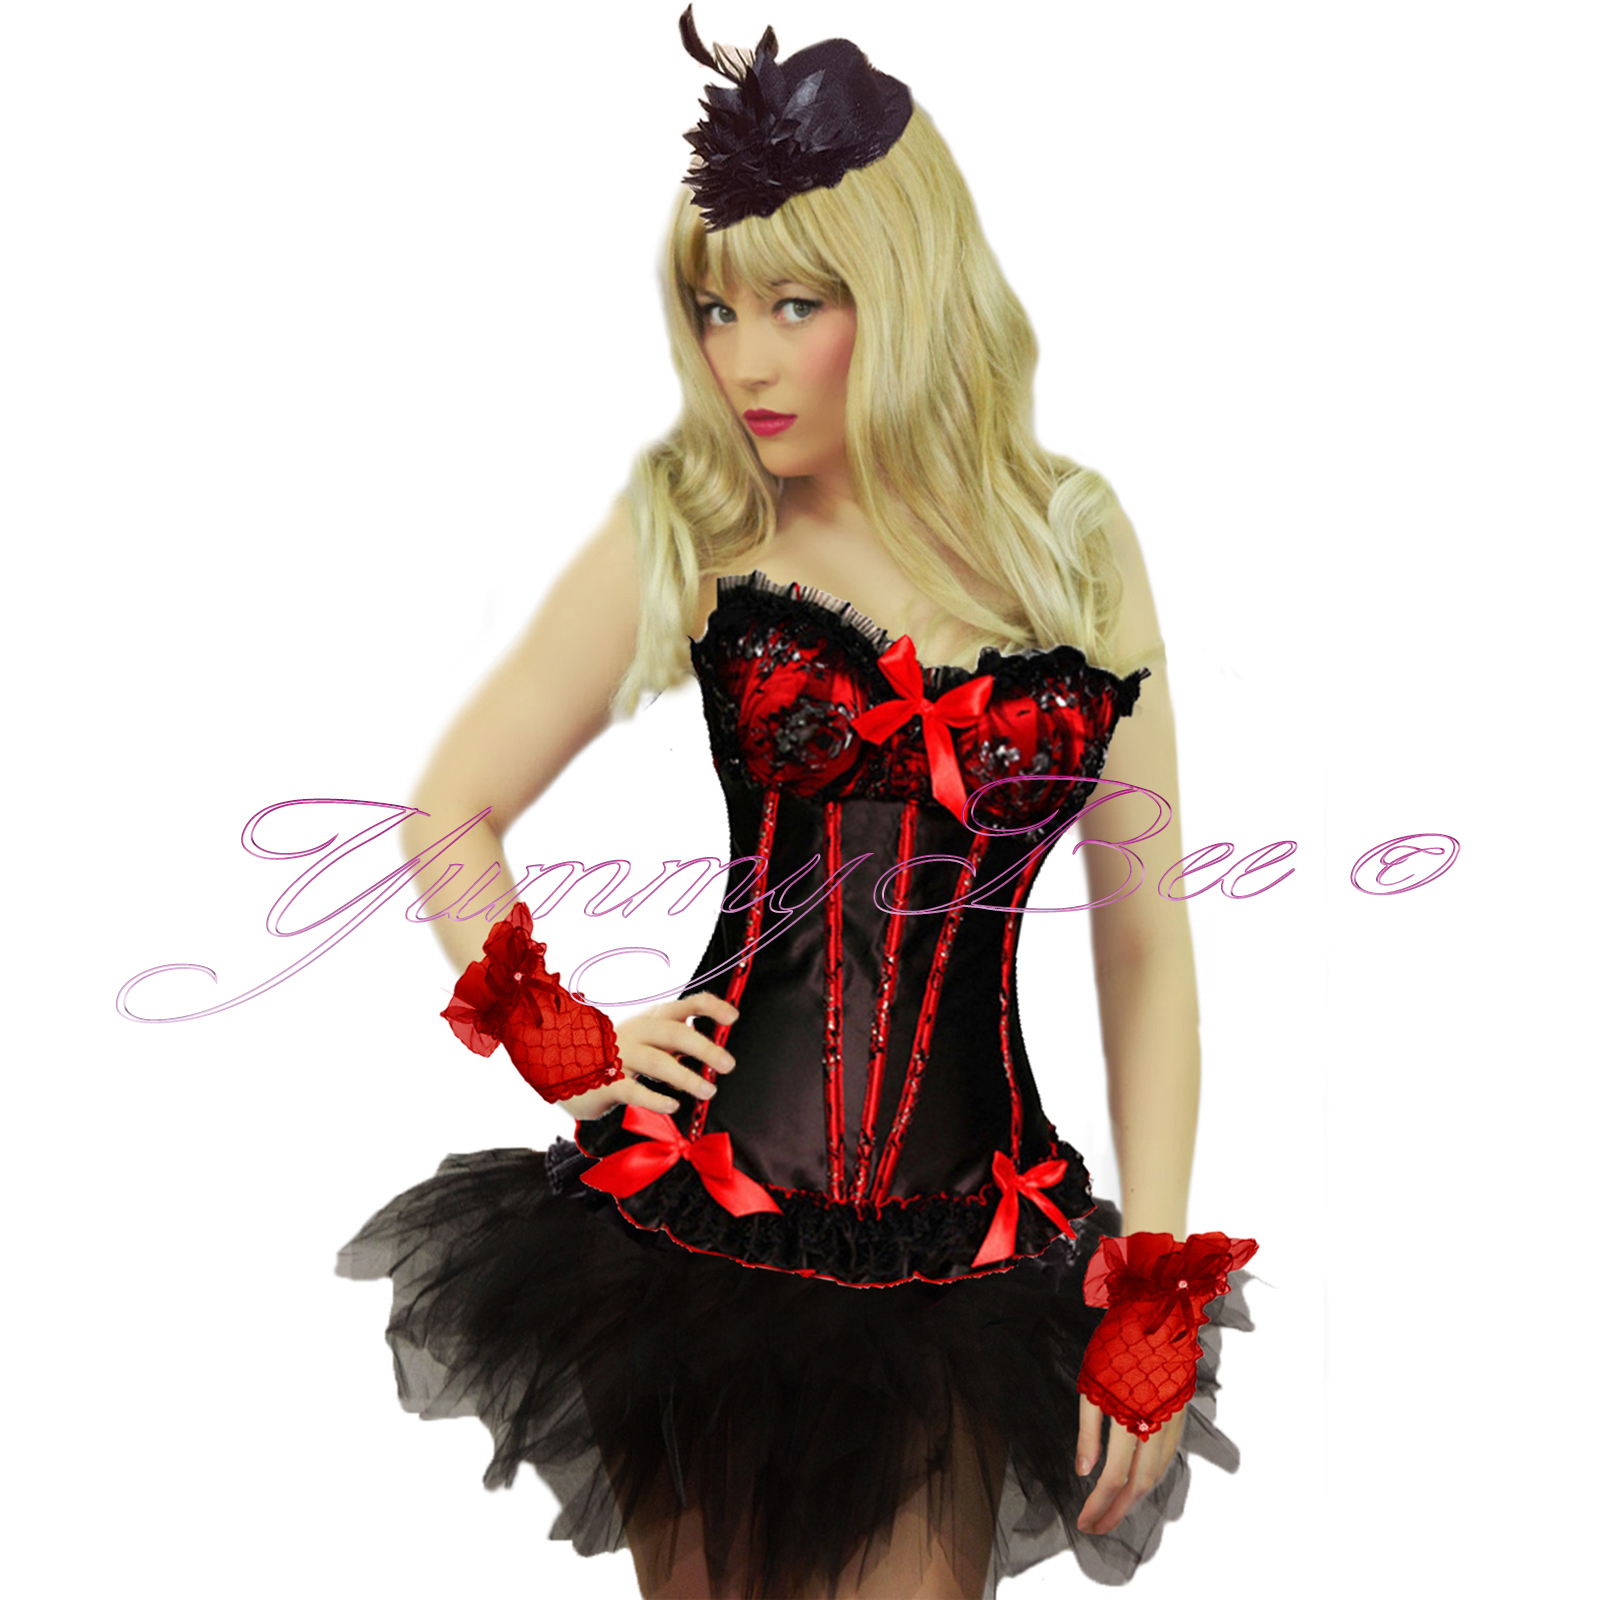 Details about Yummy Bee Burlesque Corset Tutu Fancy Dress Costume Plus Size 6 28 Moulin Can UK